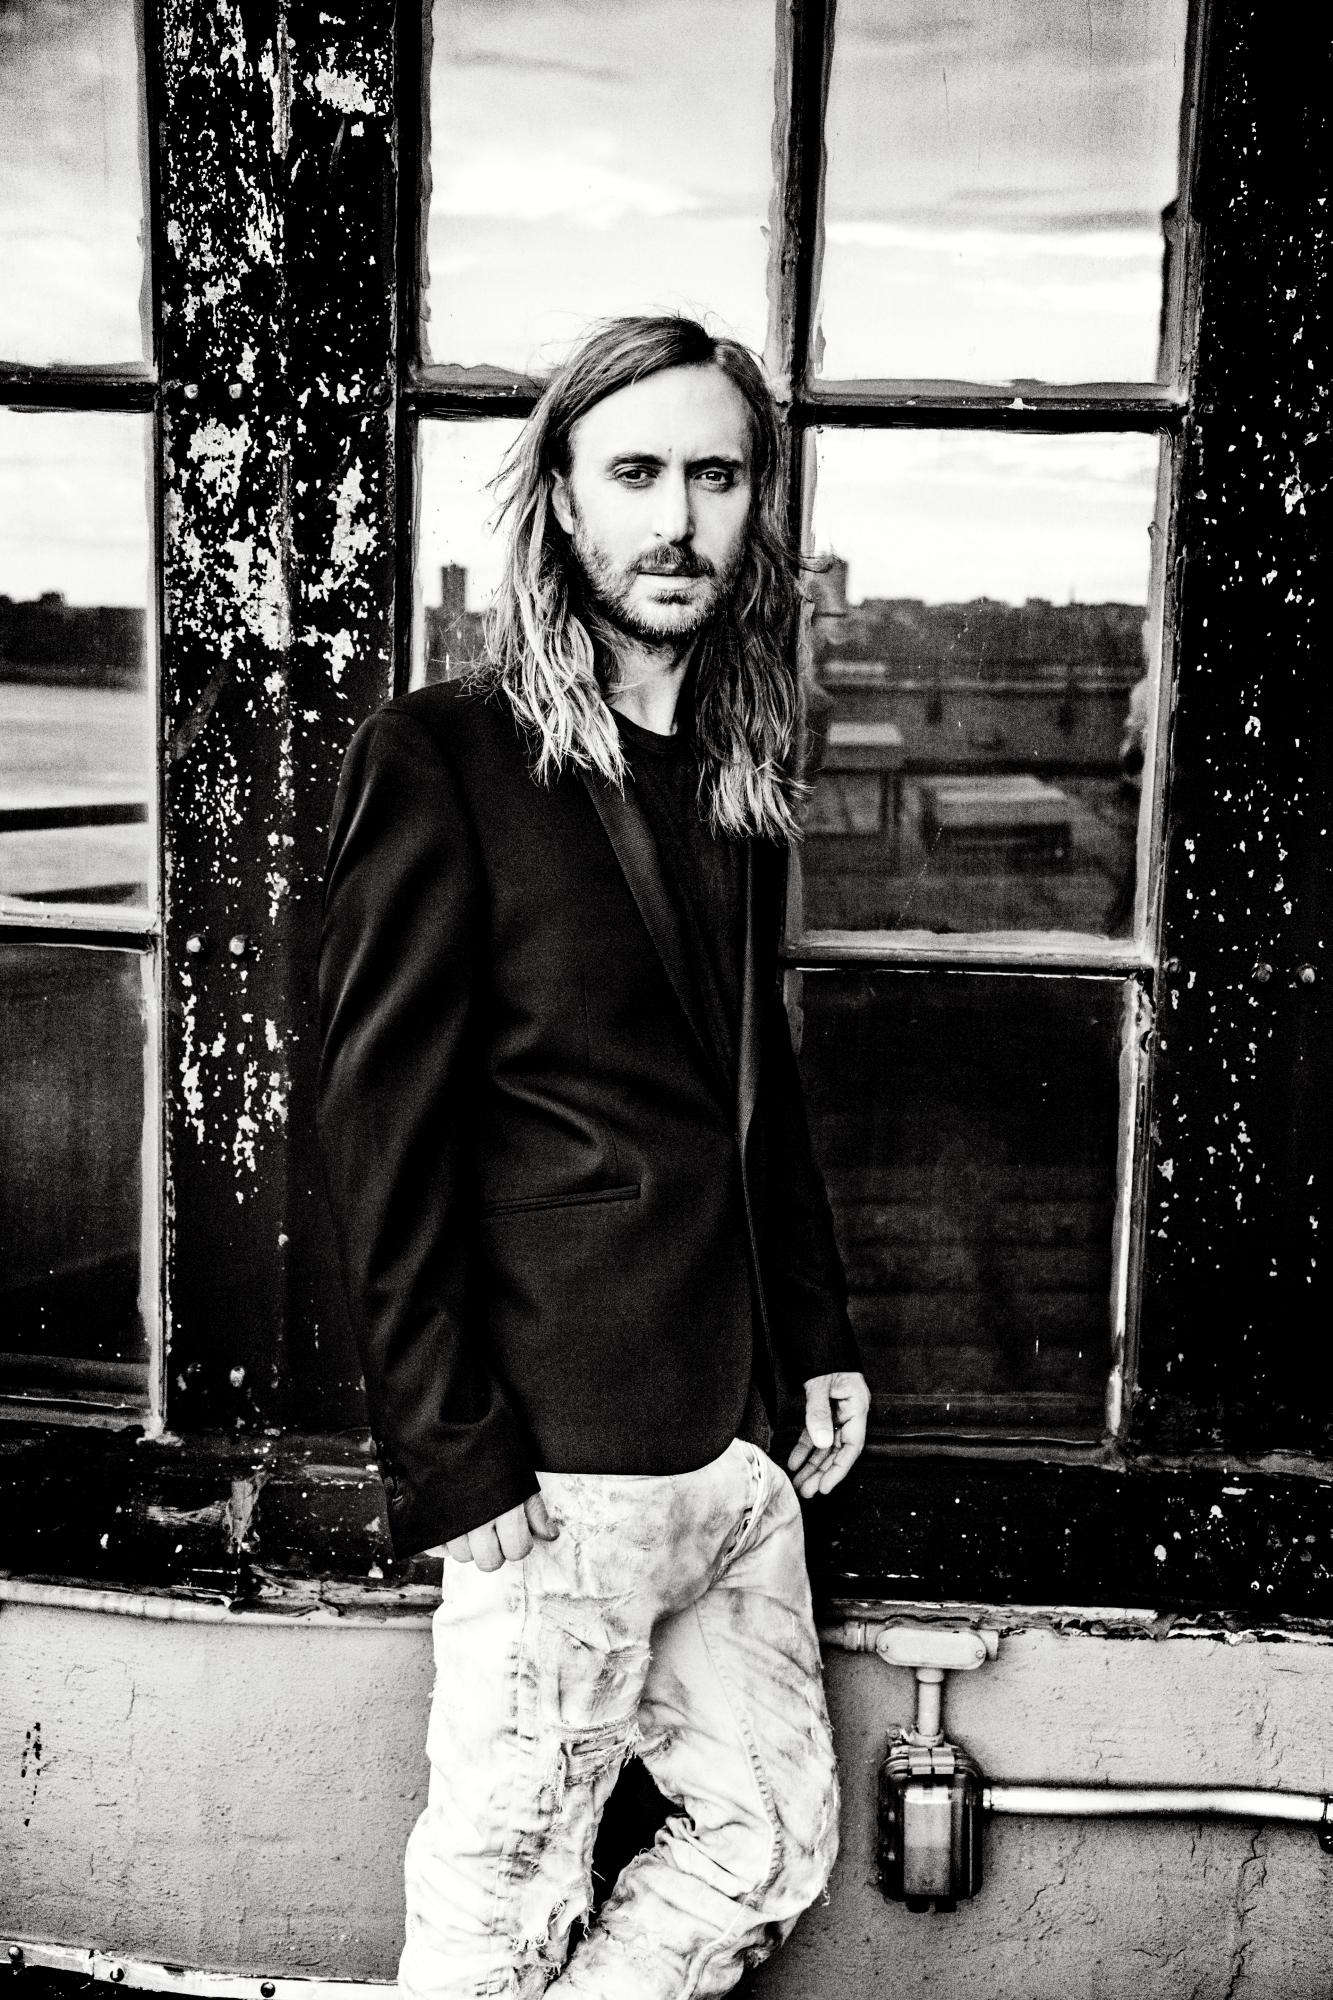 BigCityBeats SommerTagTraum by David Guetta